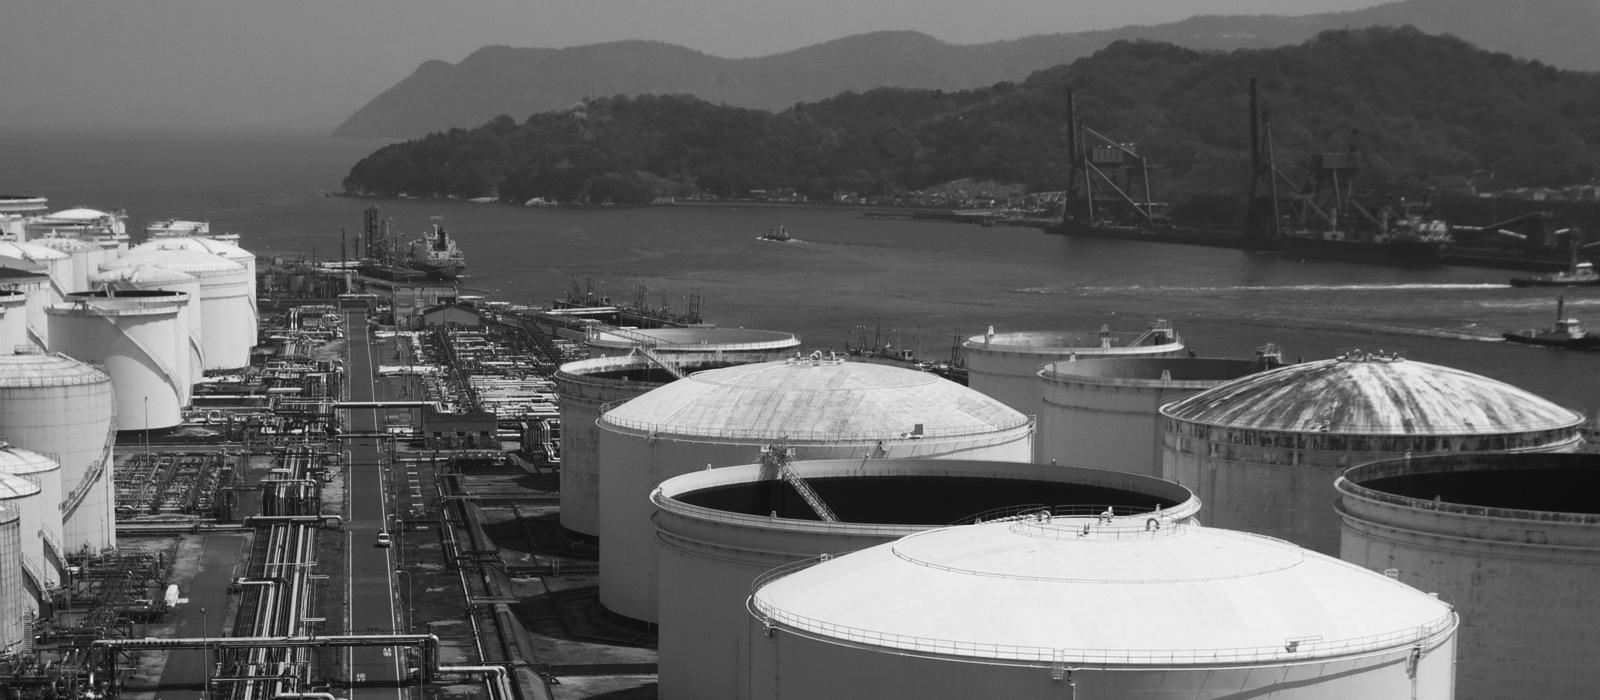 Petrochemical Plant Hydrodemolition